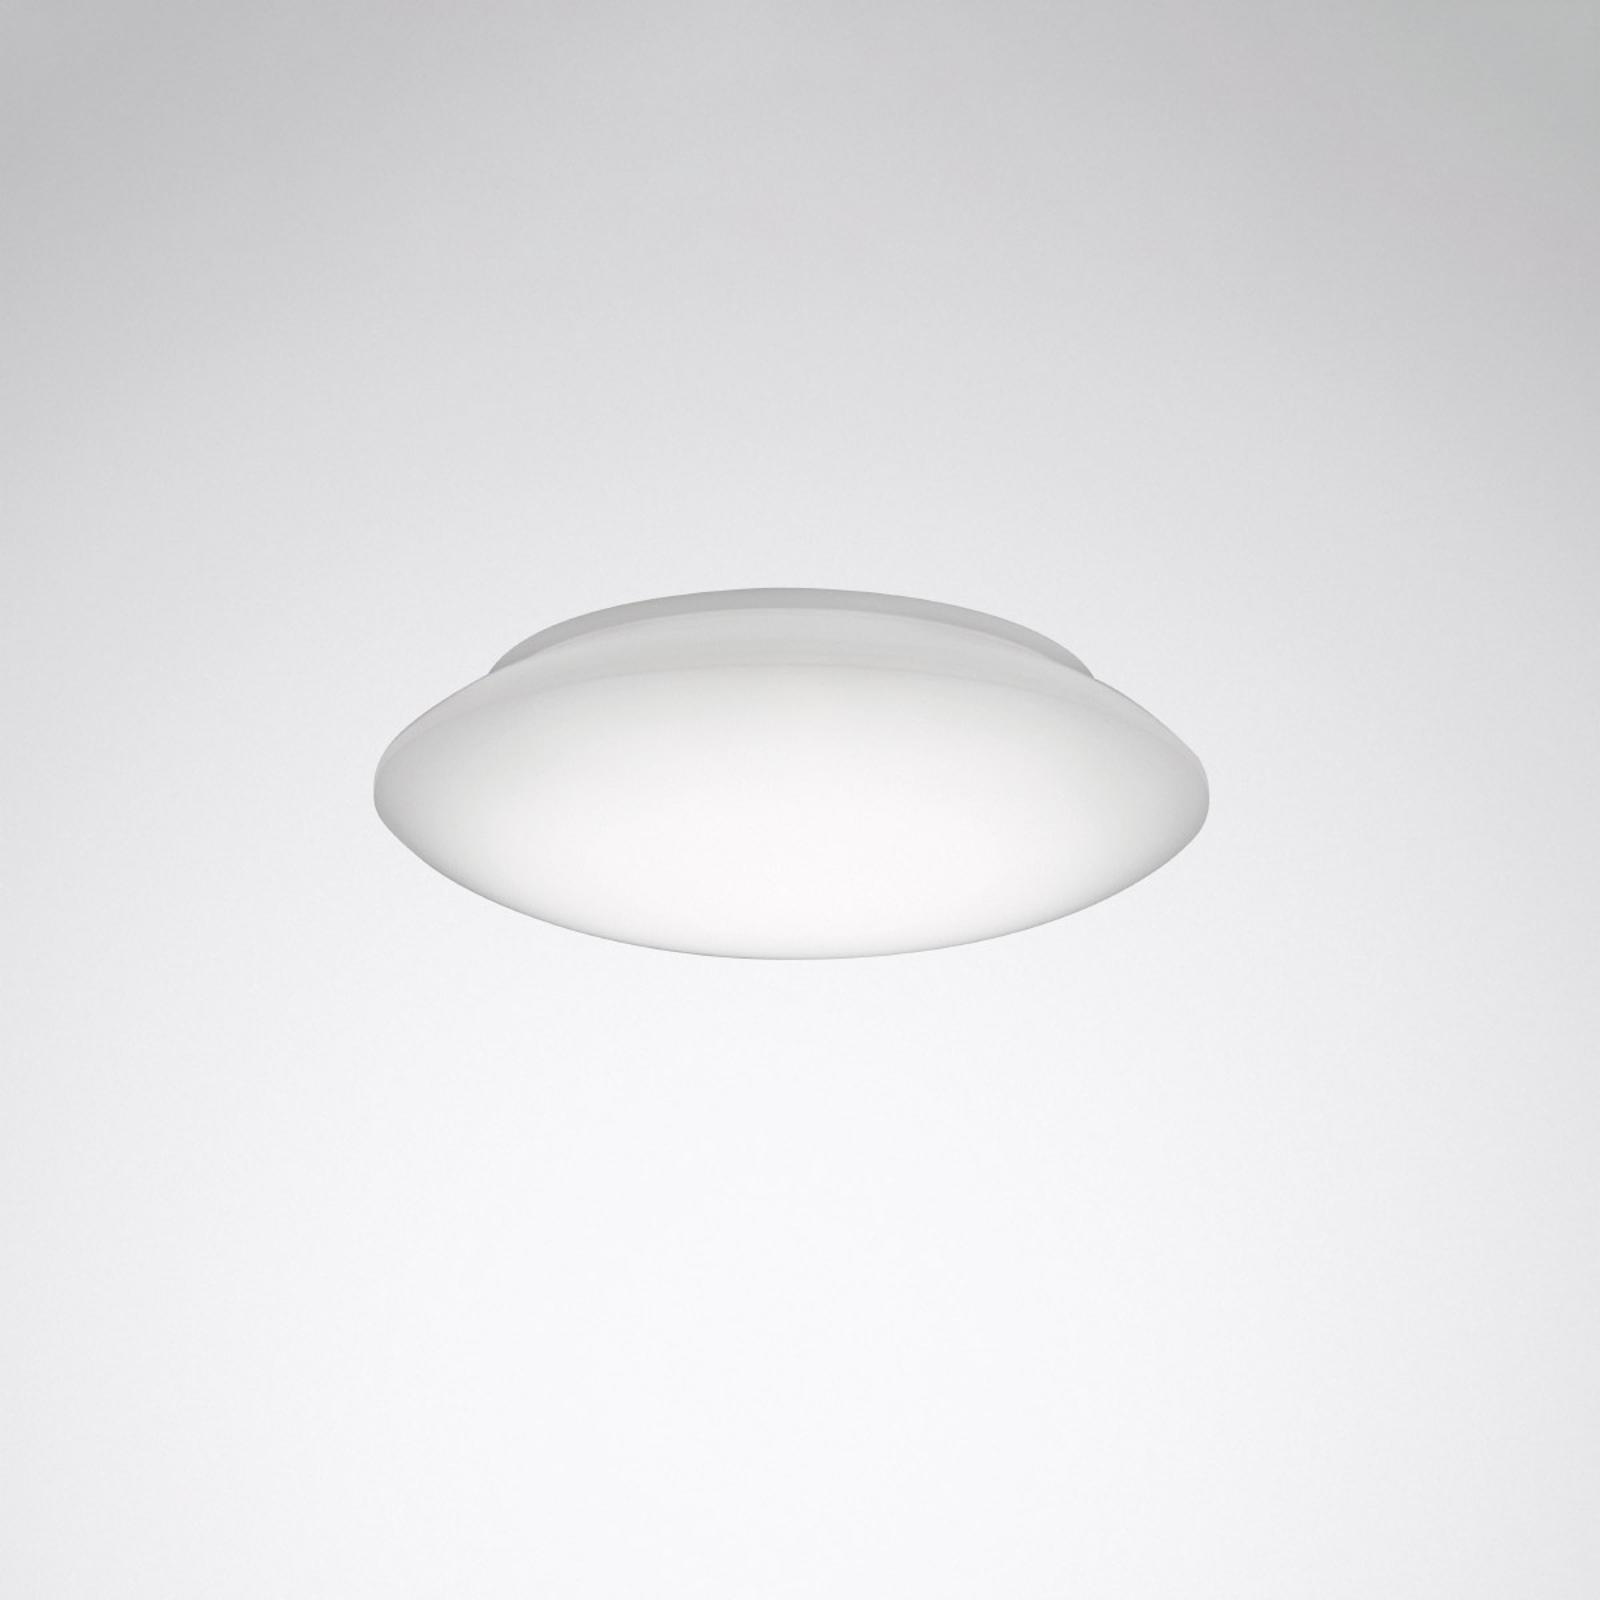 TRILUX 74R WD1 LED 1000 Deckenlampe 4.000 K